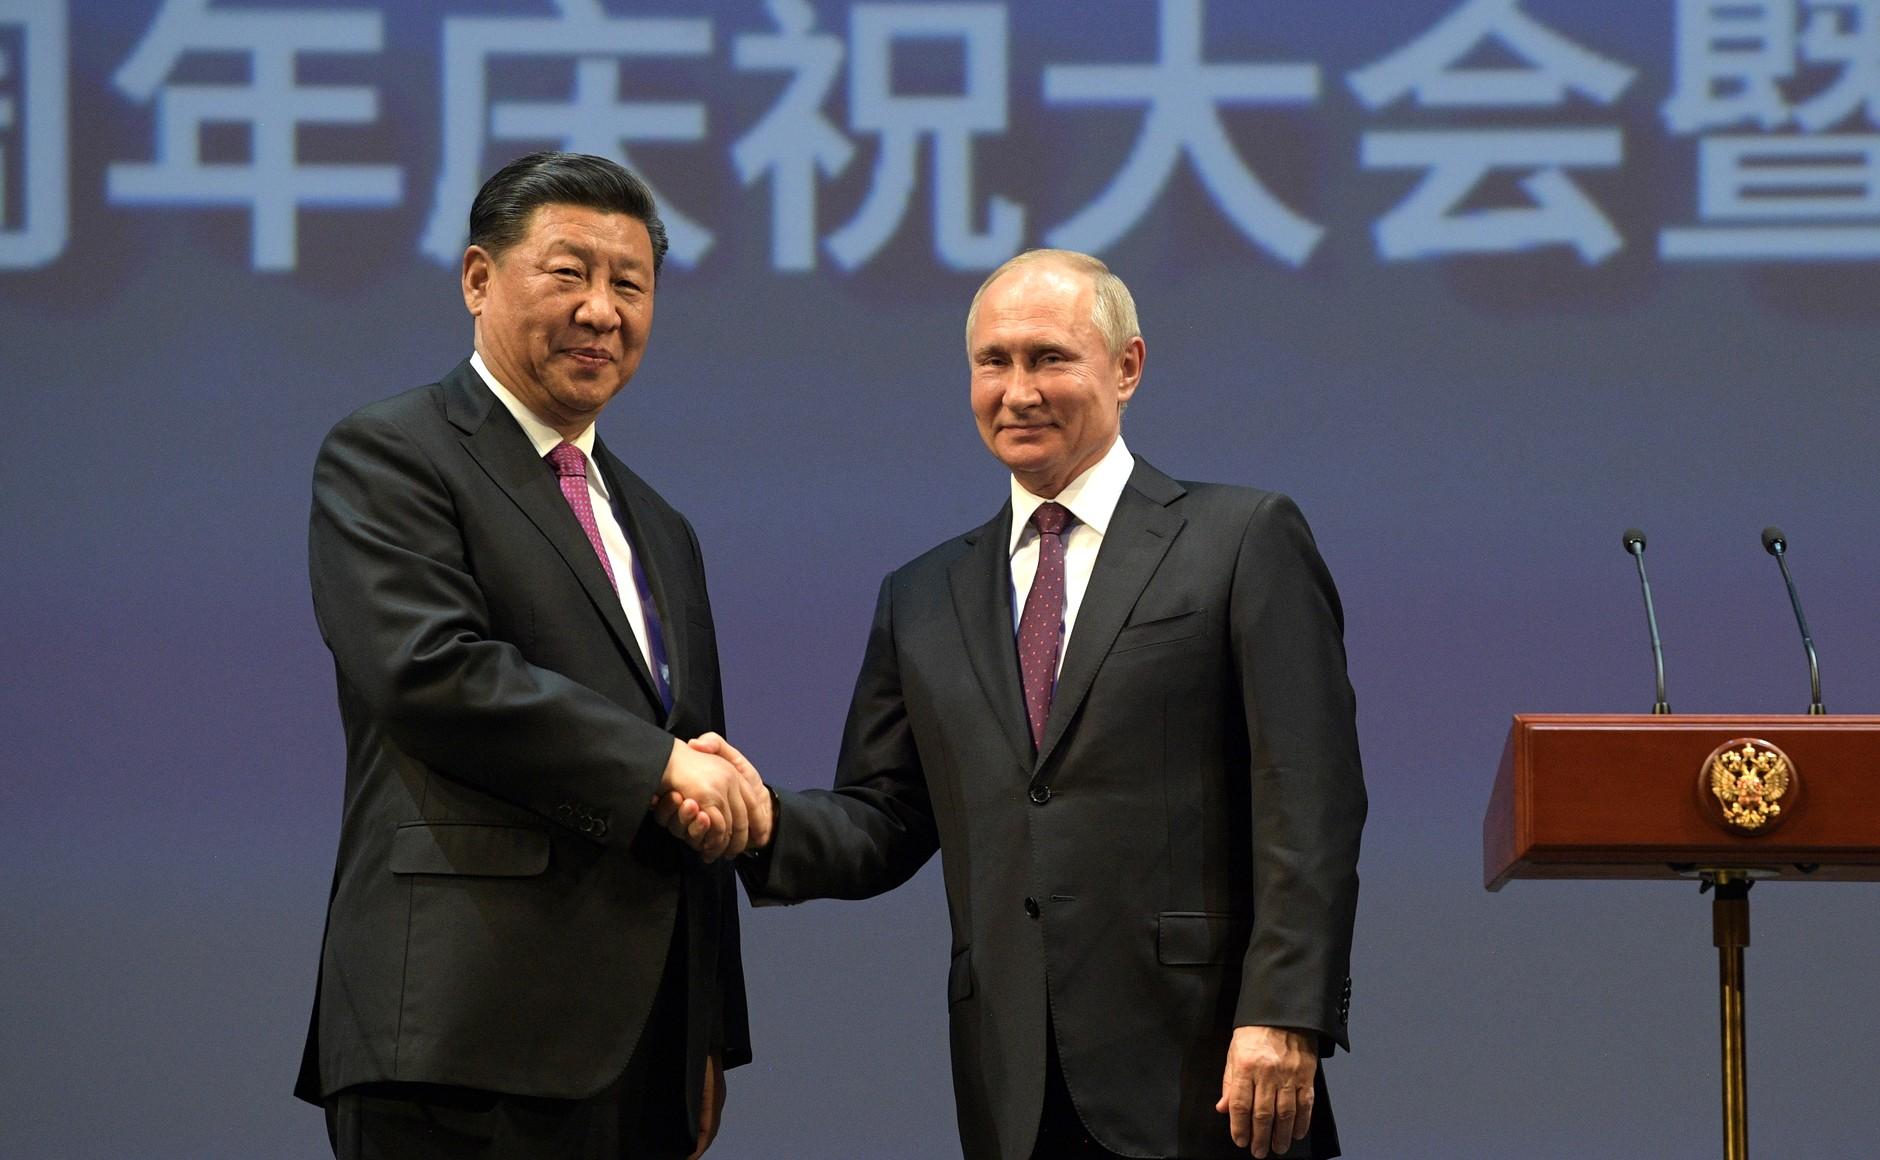 File:Vladimir Putin and Xi Jinping (2019-06-05) 66.jpg - Wikimedia Commons